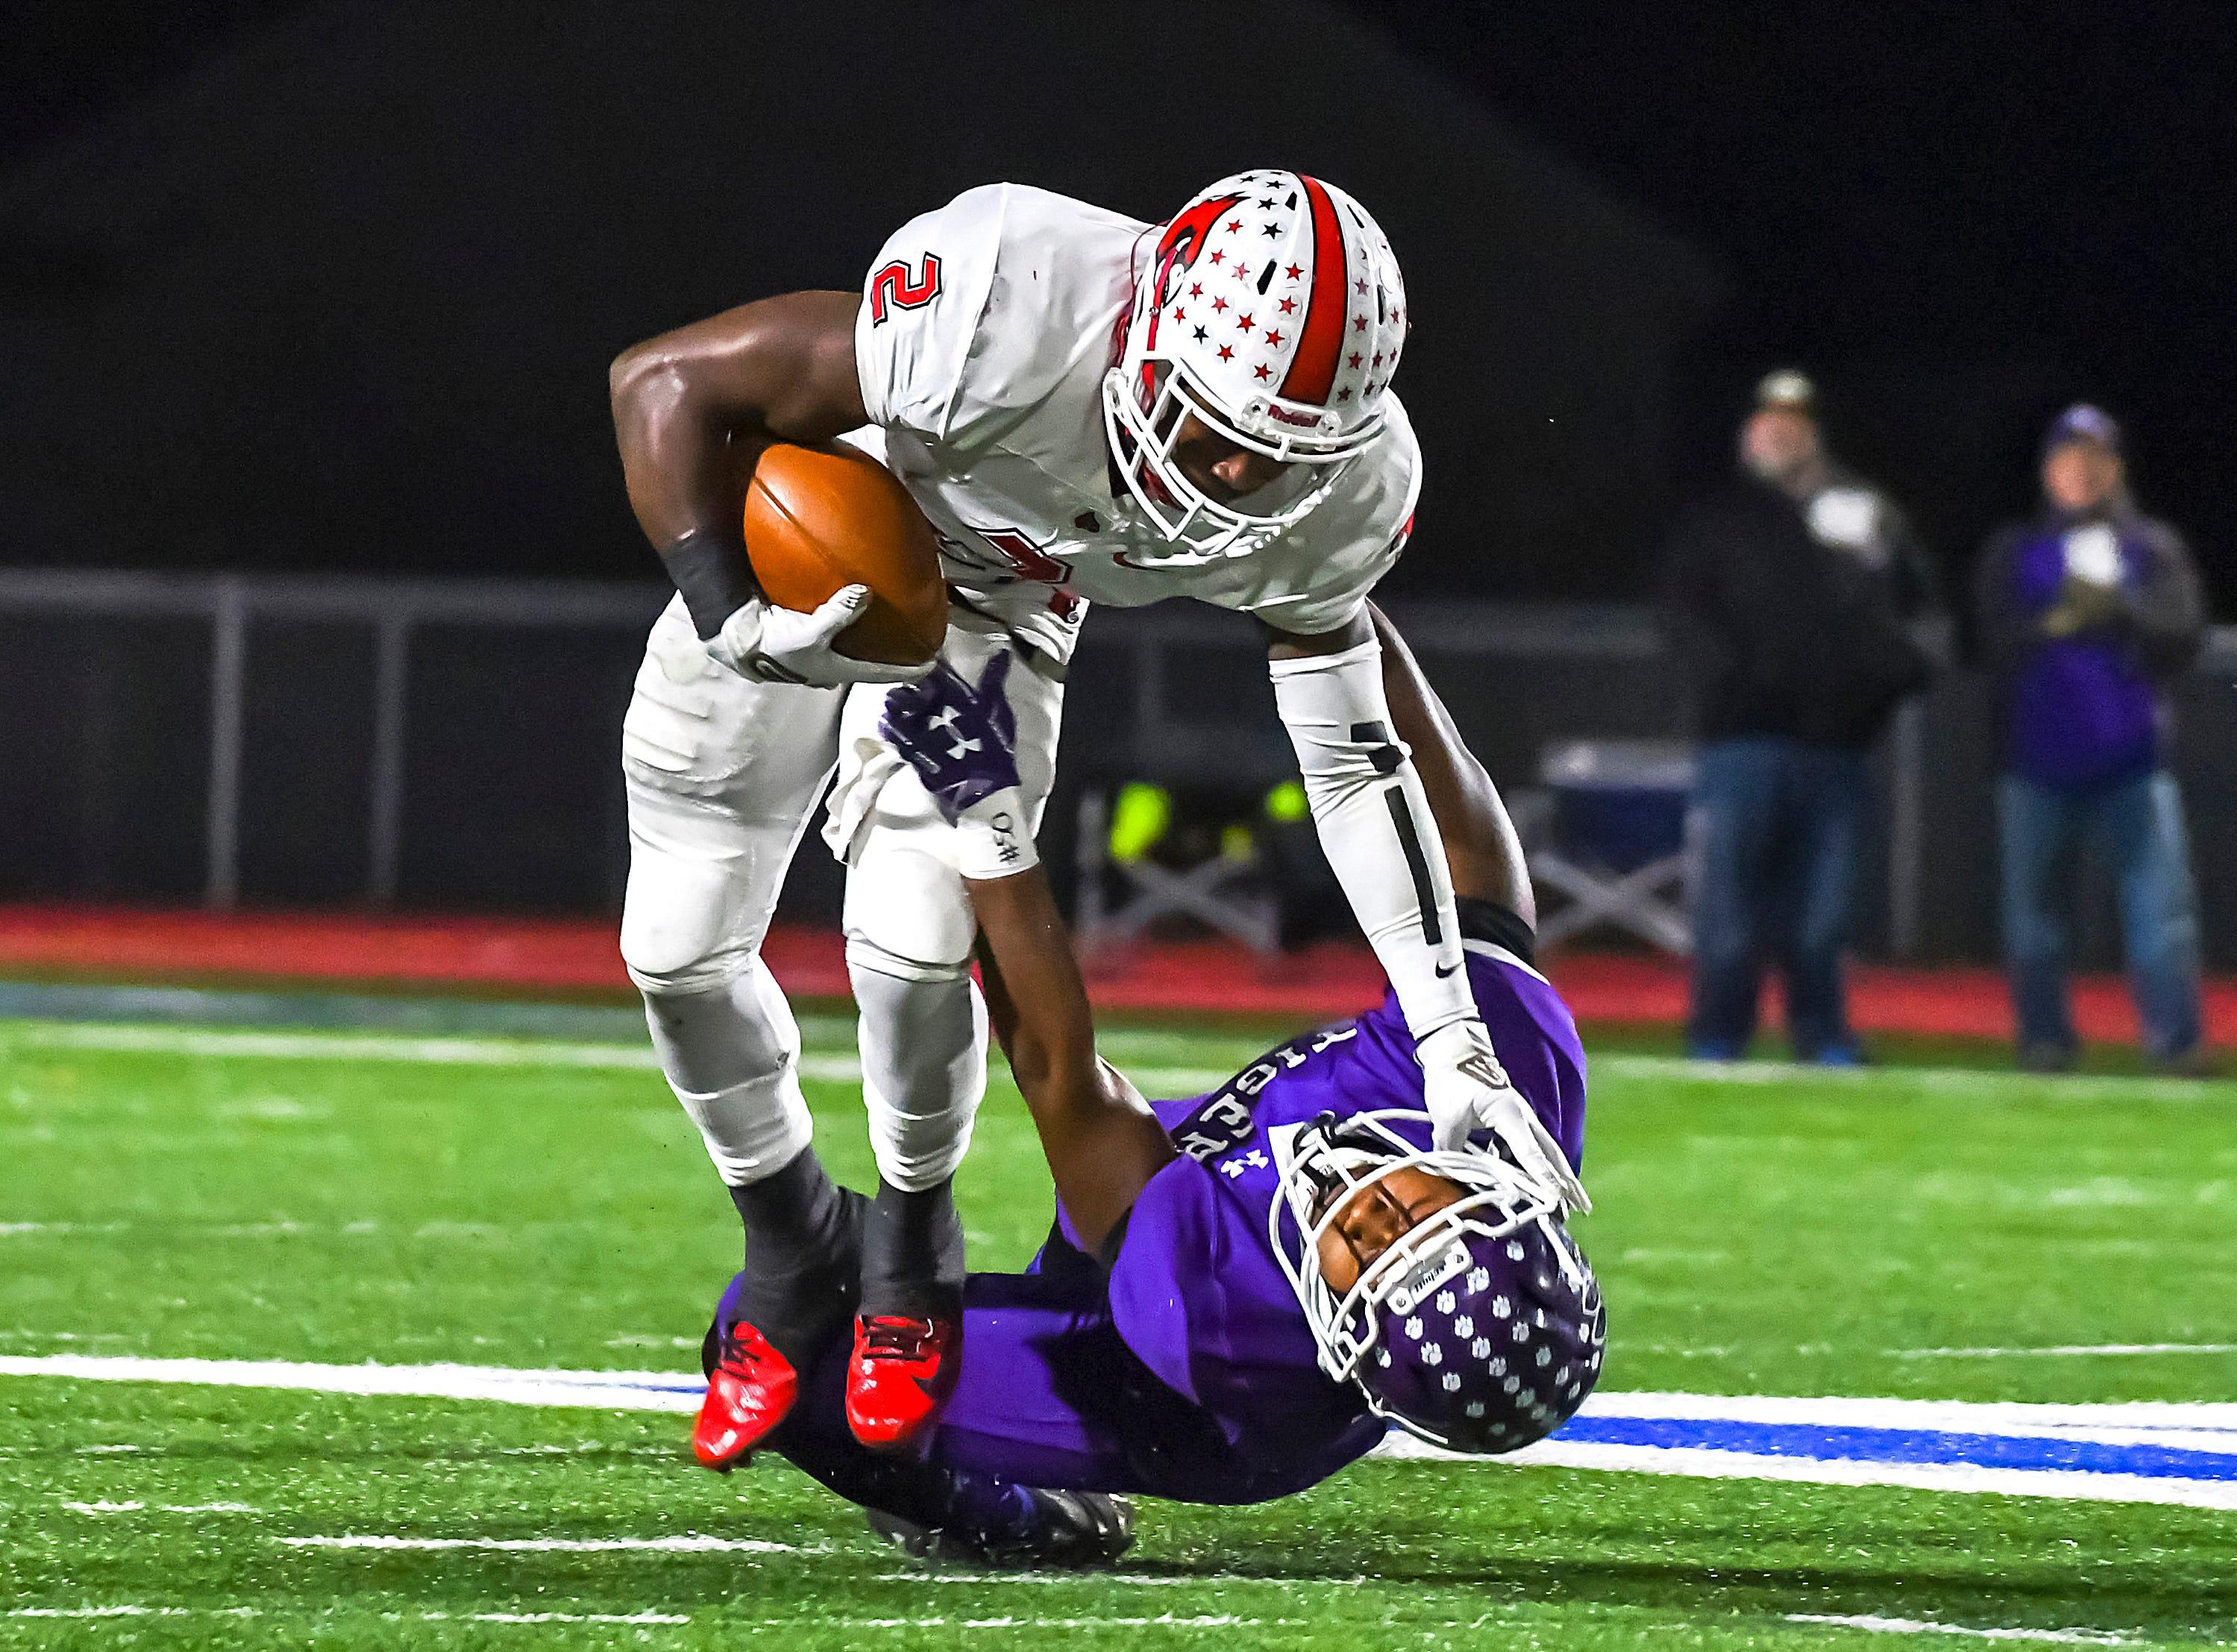 Colerain quarterback Deante Smith-Moore (2) stiff-arms a Pickerington Central defender in the OHSAA Region IV DI state semifinal at Piqua High School, Friday Nov. 23, 2018.